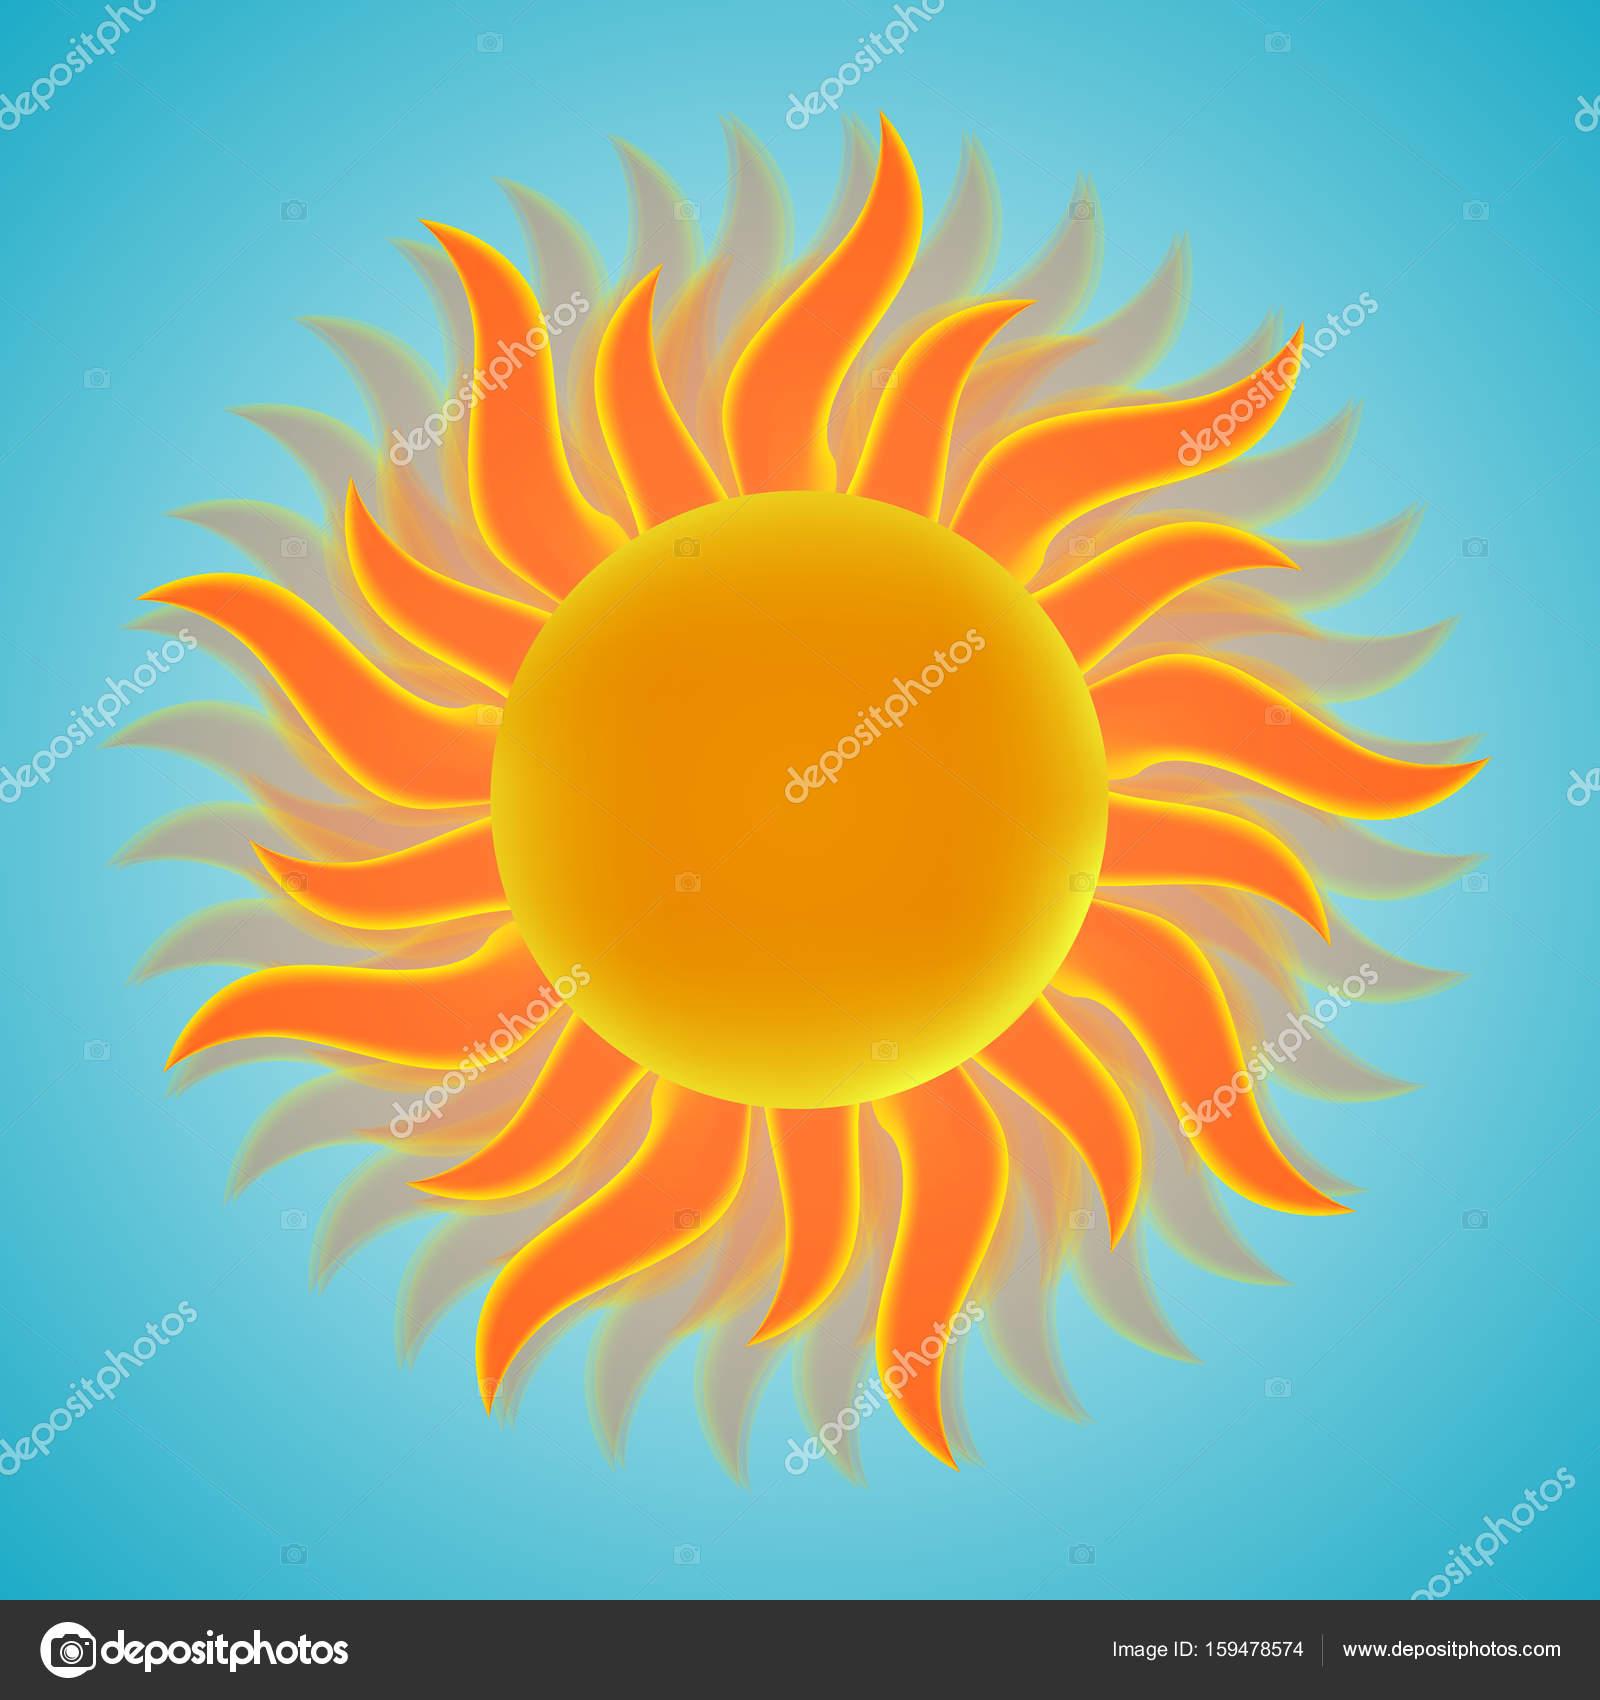 e2fa506846 Κυρ εικονίδιο με τον ήλιο. Σύμβολο του ήλιου. Εικονογράφηση διάνυσμα. EPS  10– εικονογράφηση αρχείου